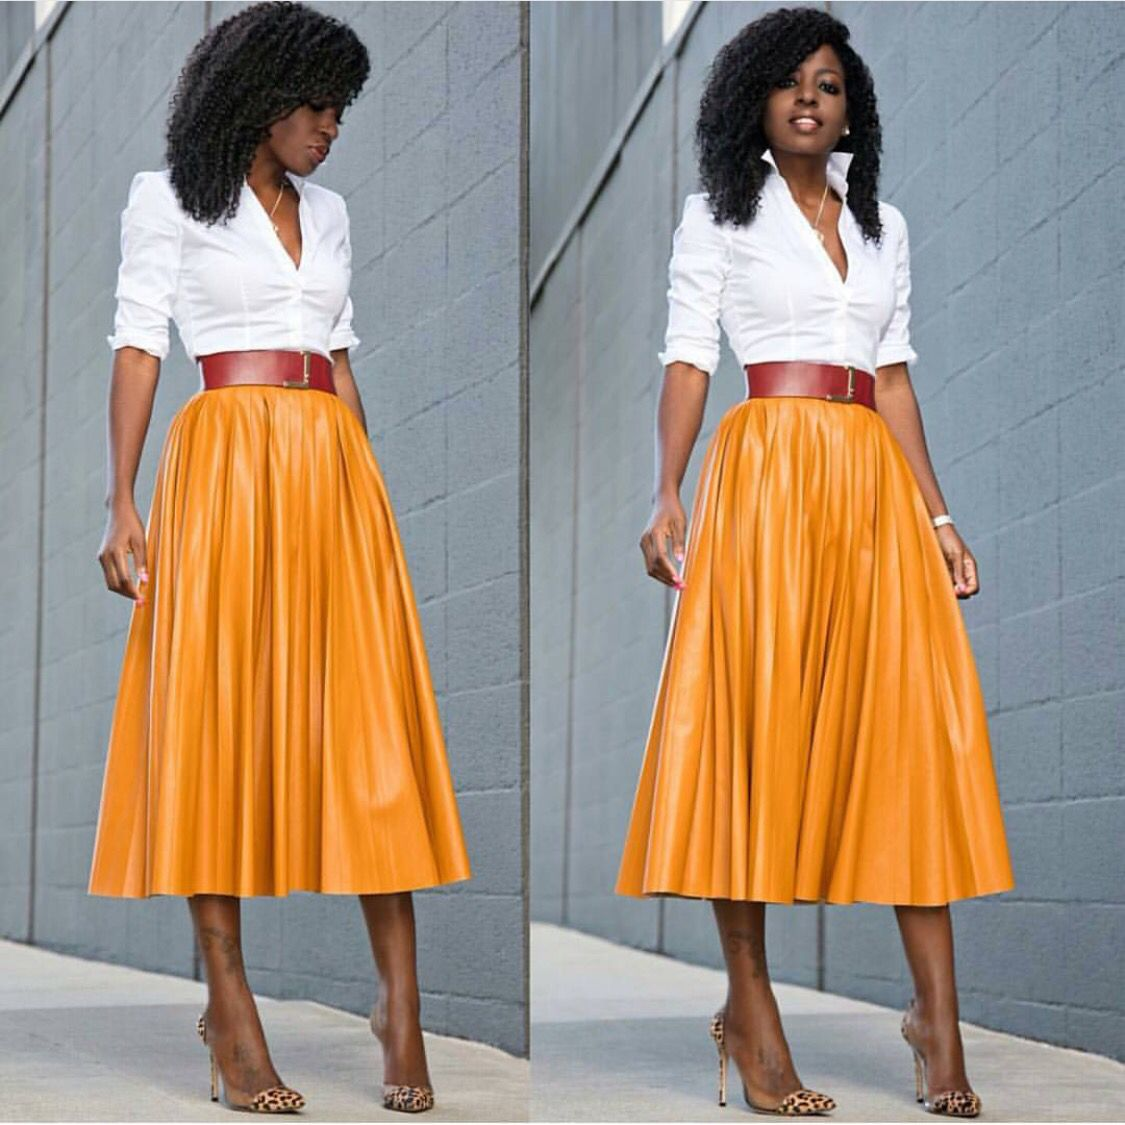 a1513ce9b081e Fresh mango colored skirt combo. Bring creative skirting back! I love this  ensemble.